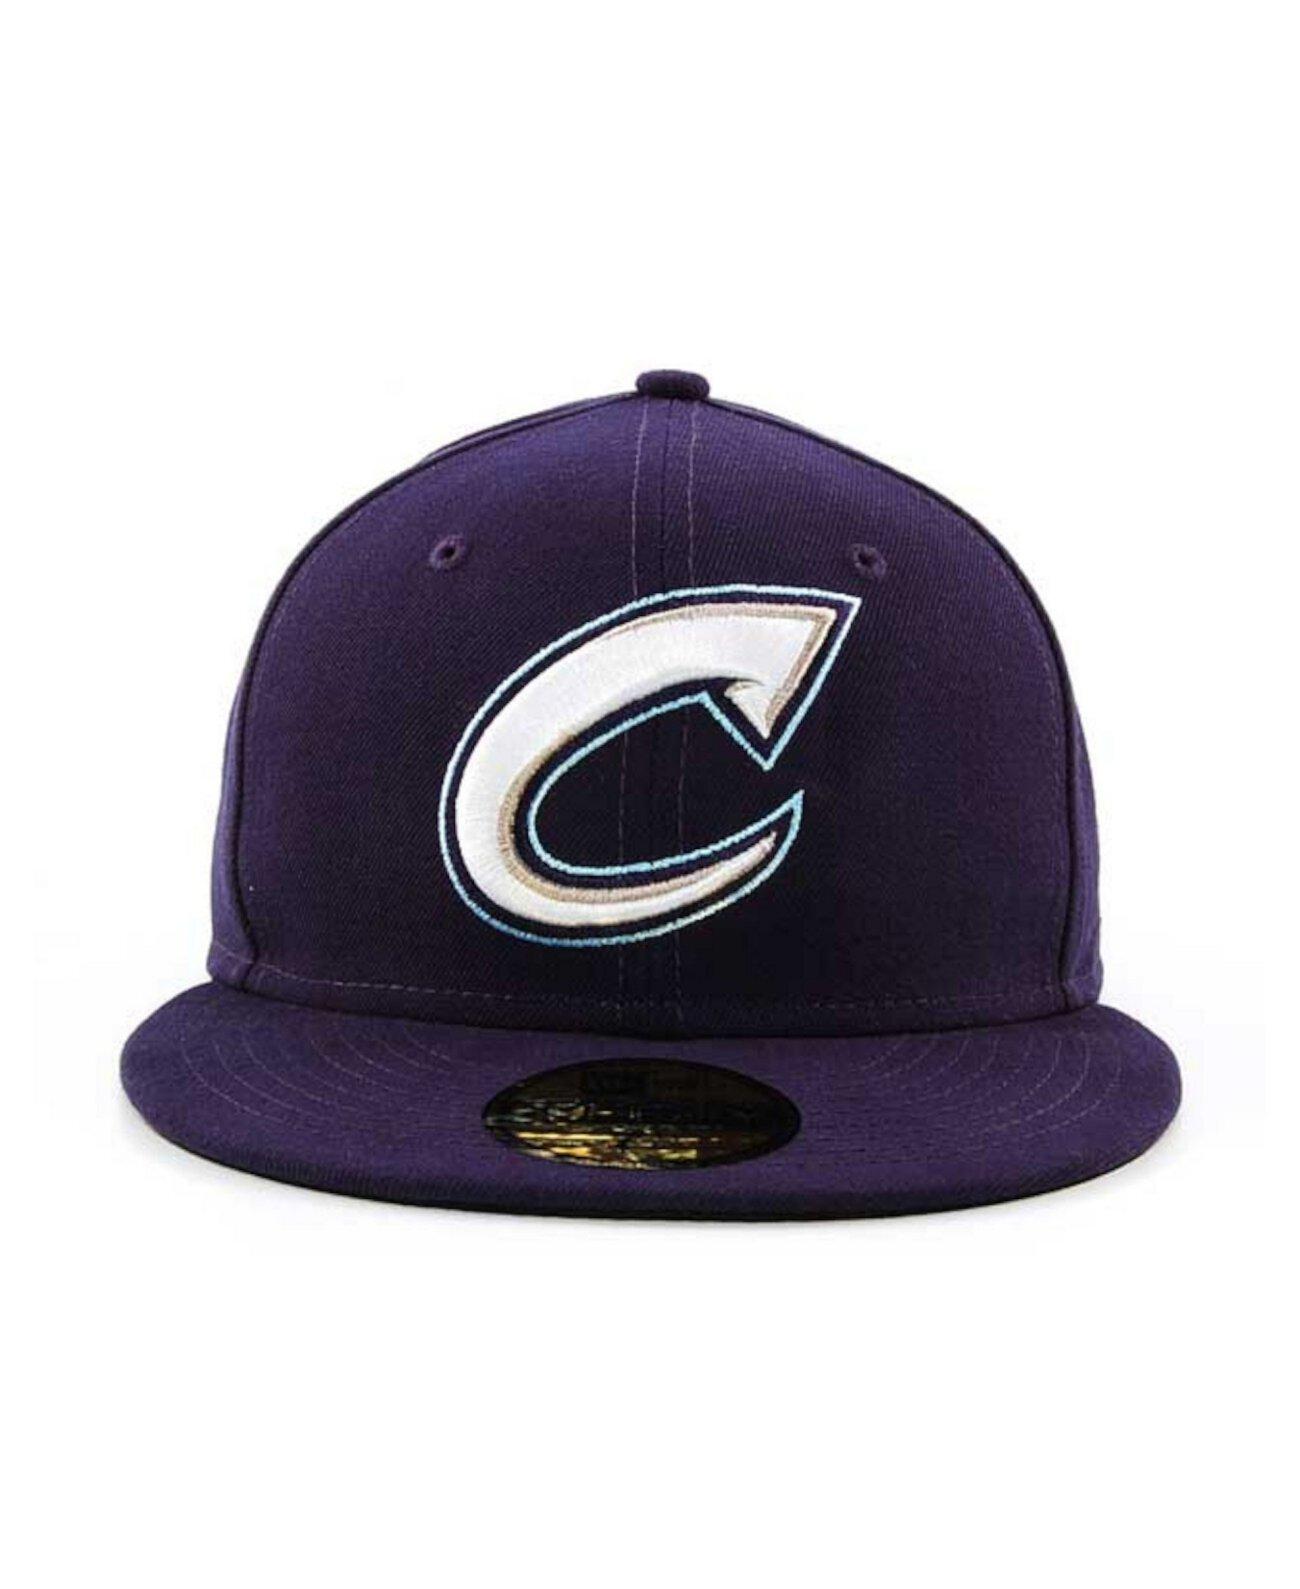 Columbus Clippers MiLB 59FIFTY Cap Columbus Clippers New Era